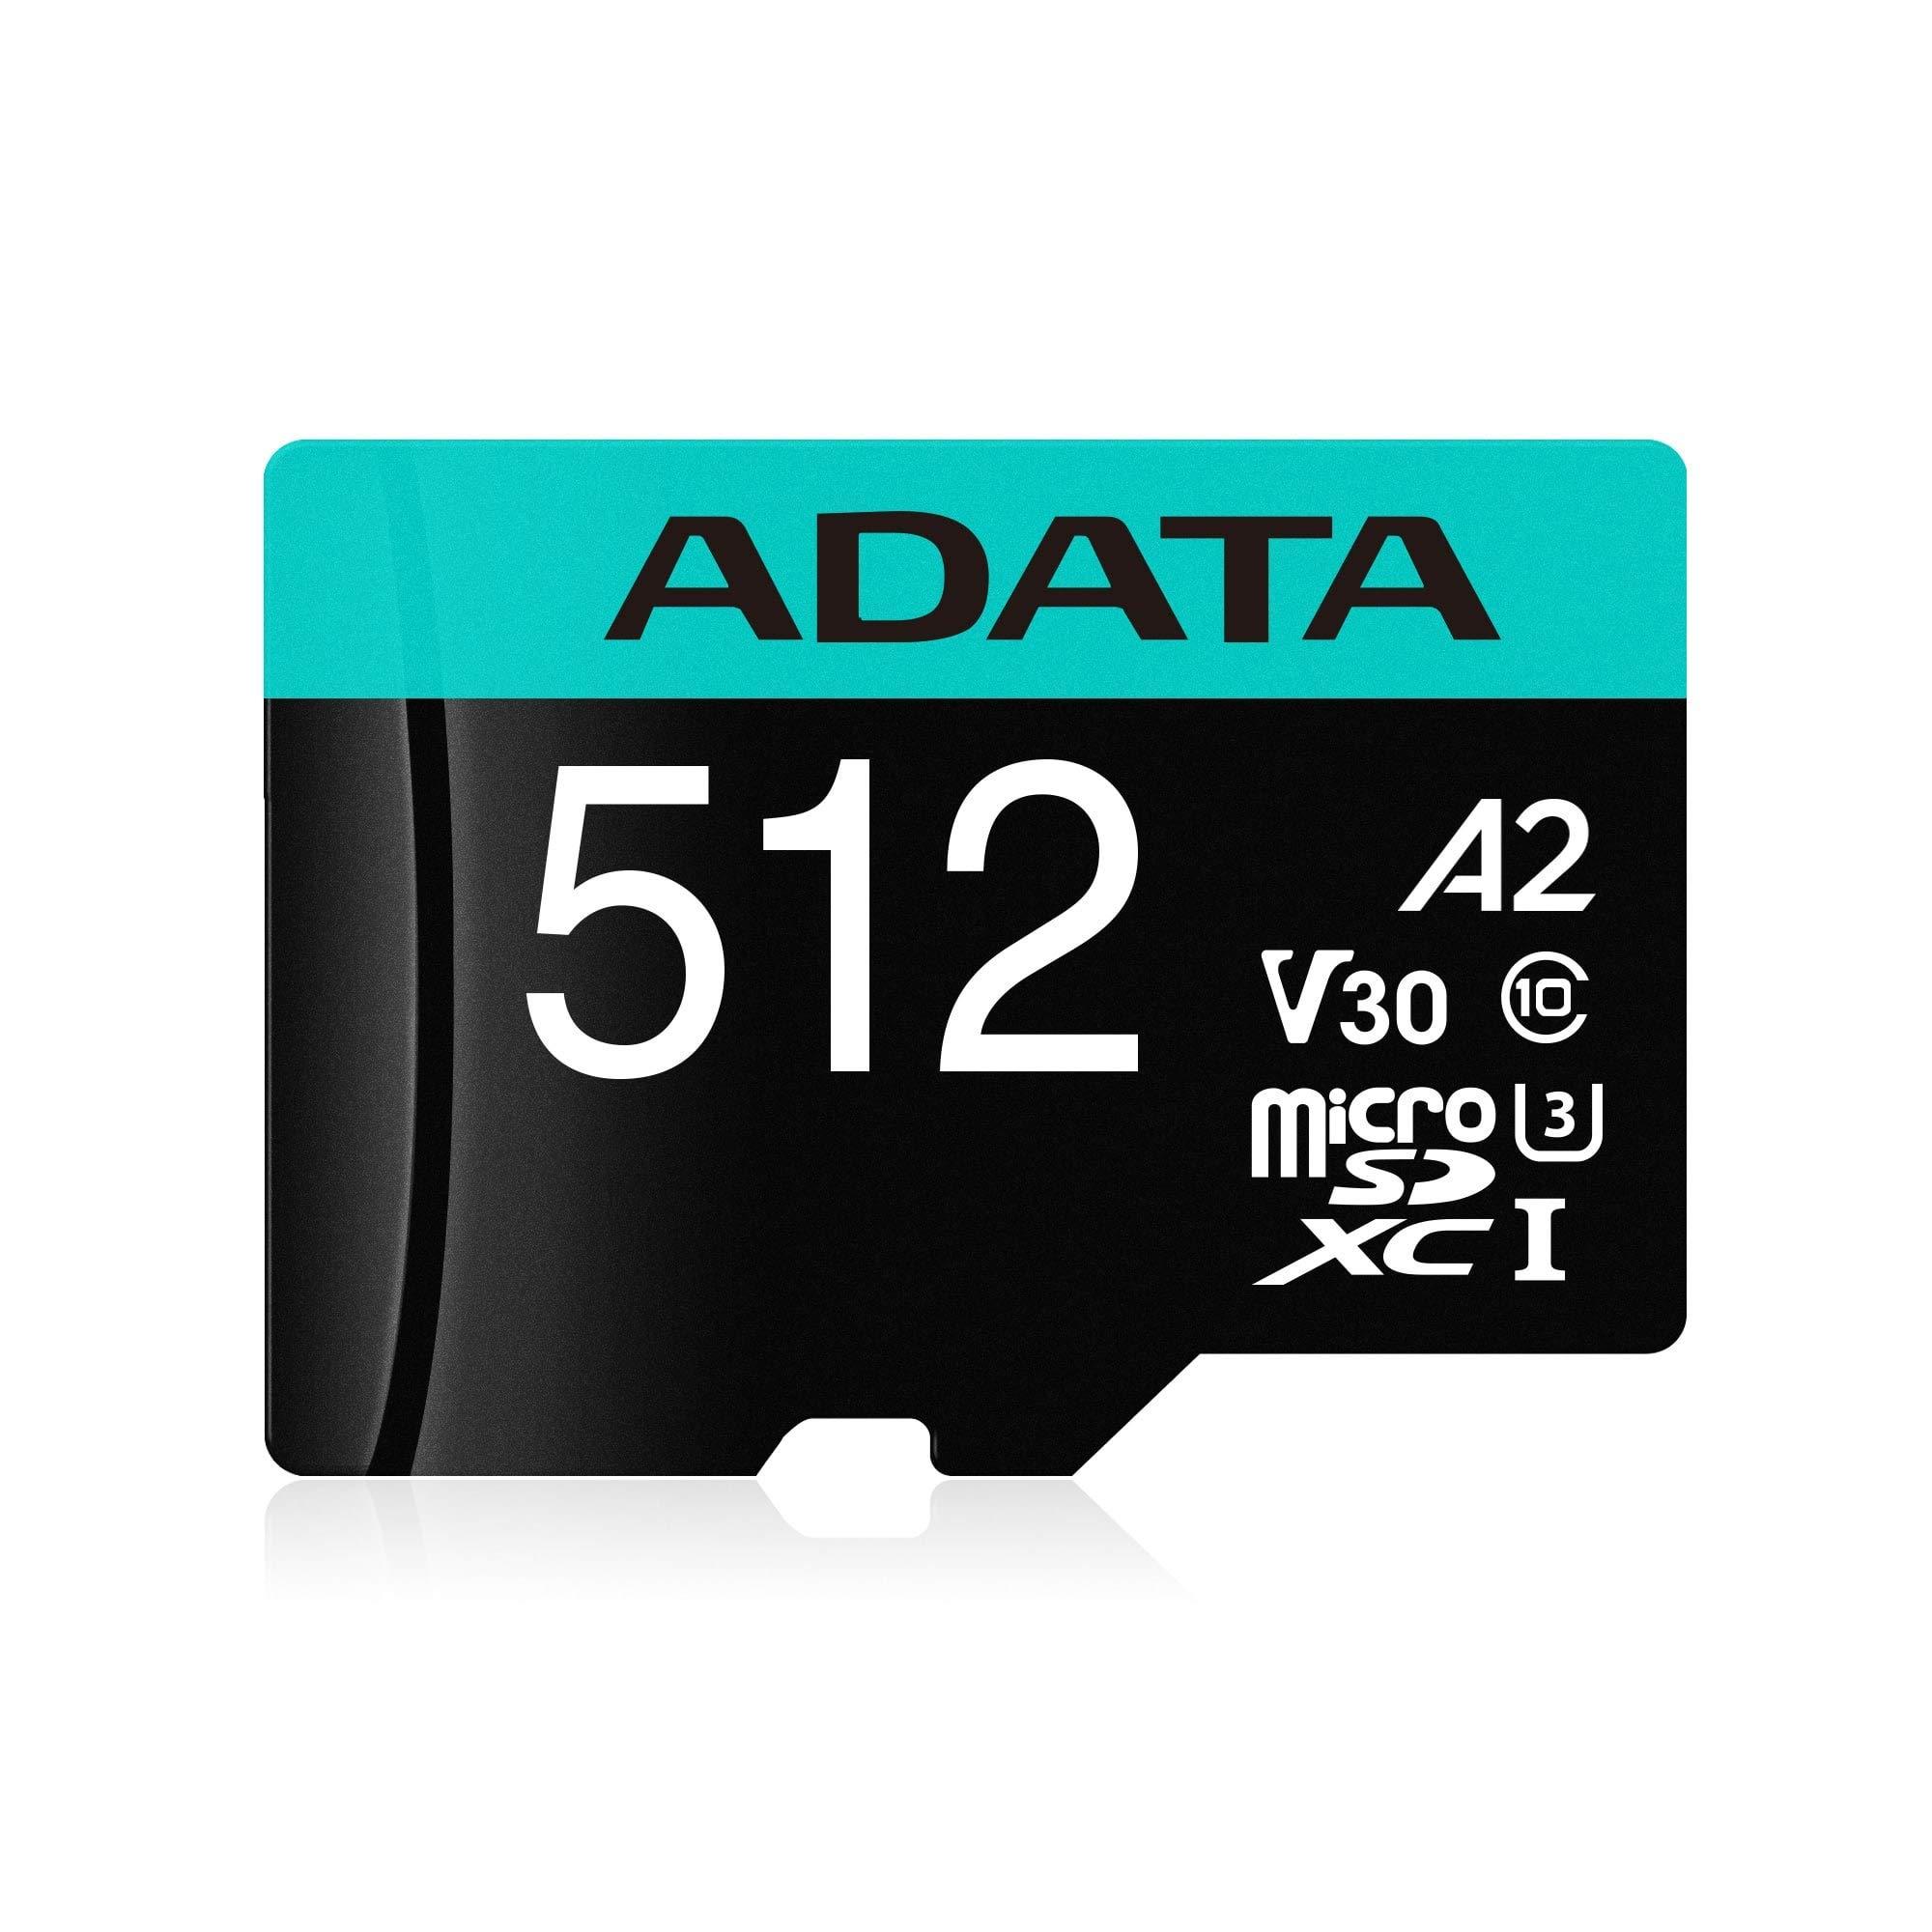 ADATA 512G MICROSDXC Uhs-I U3 Class 10